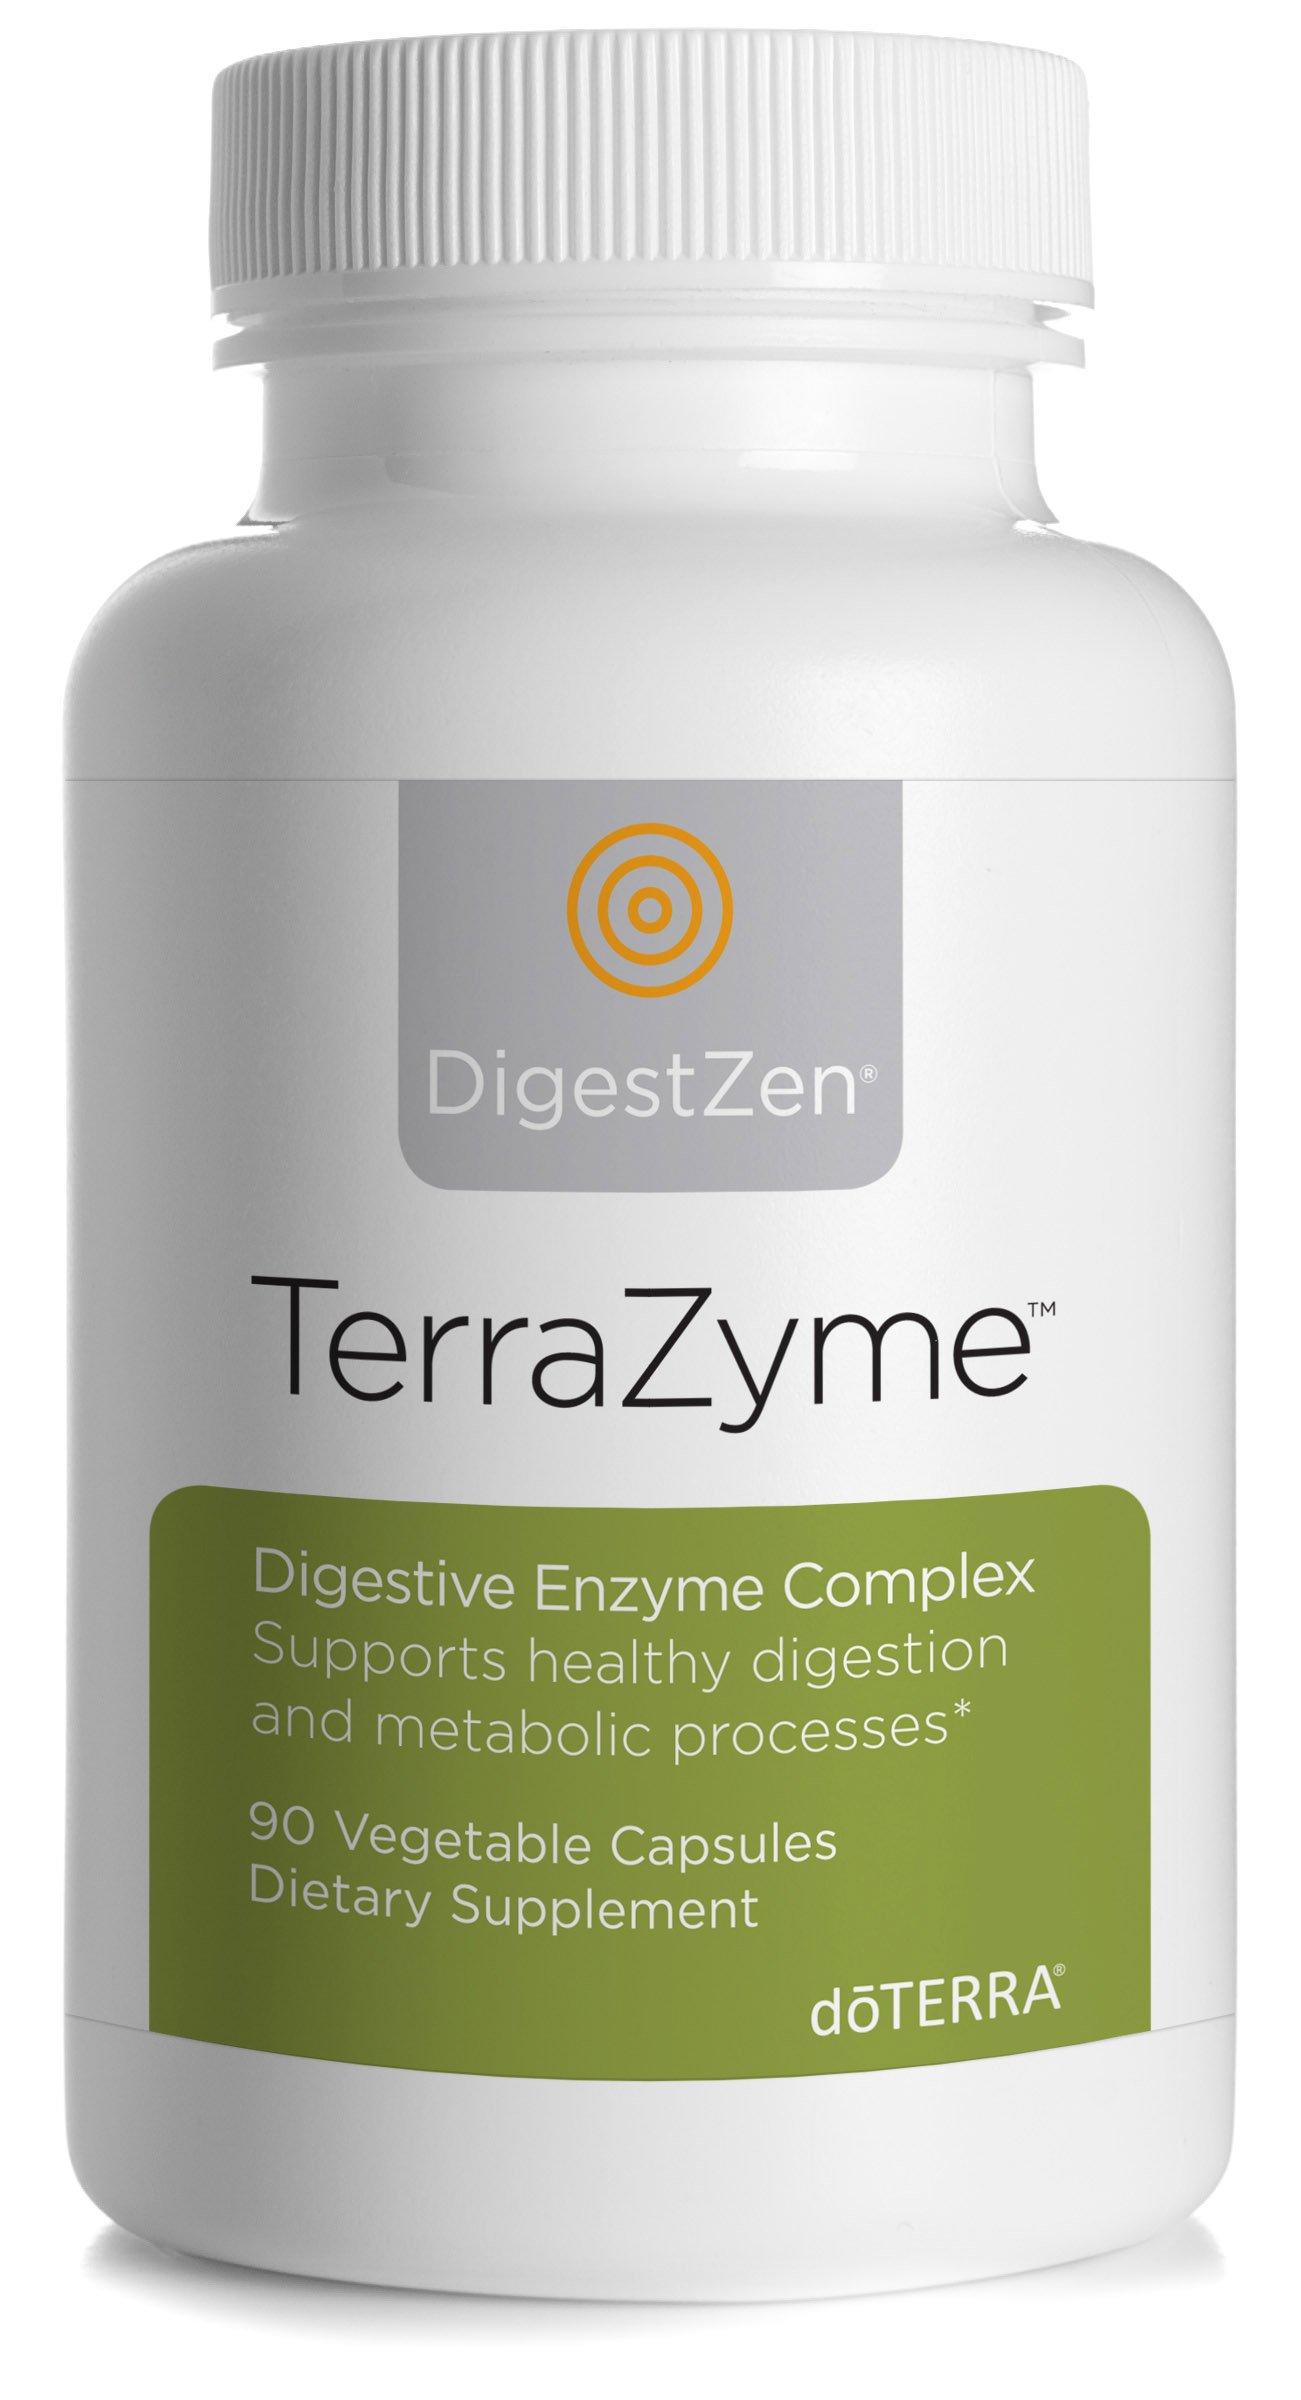 doTERRA - TerraZyme Digestive Enzyme Complex - 90 Veg Caps